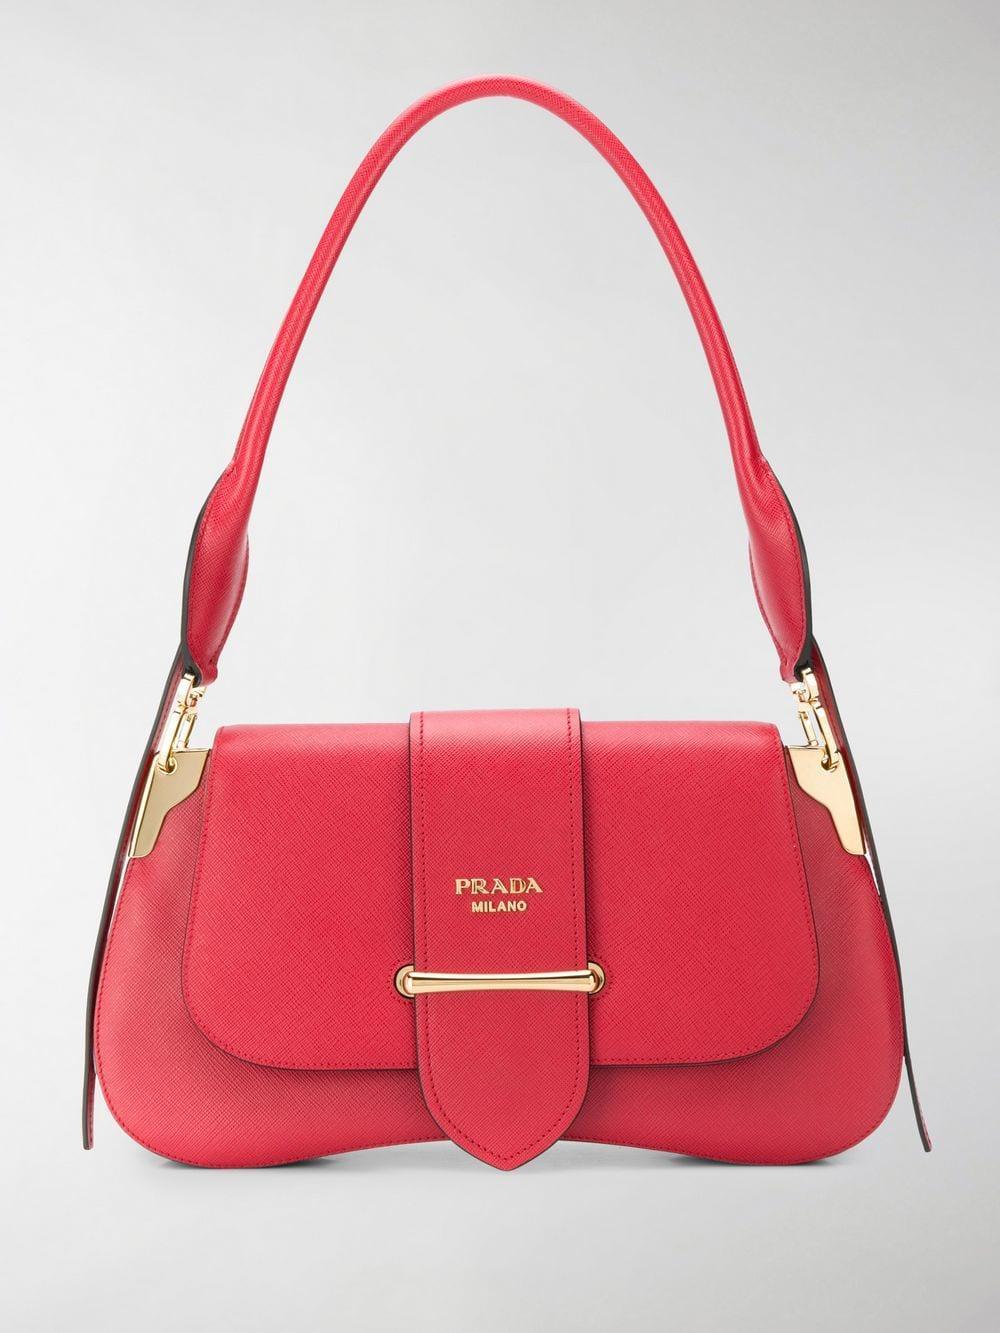 2d40beb716 Lyst - Prada Sidonie Medium Shoulder Bag in Red